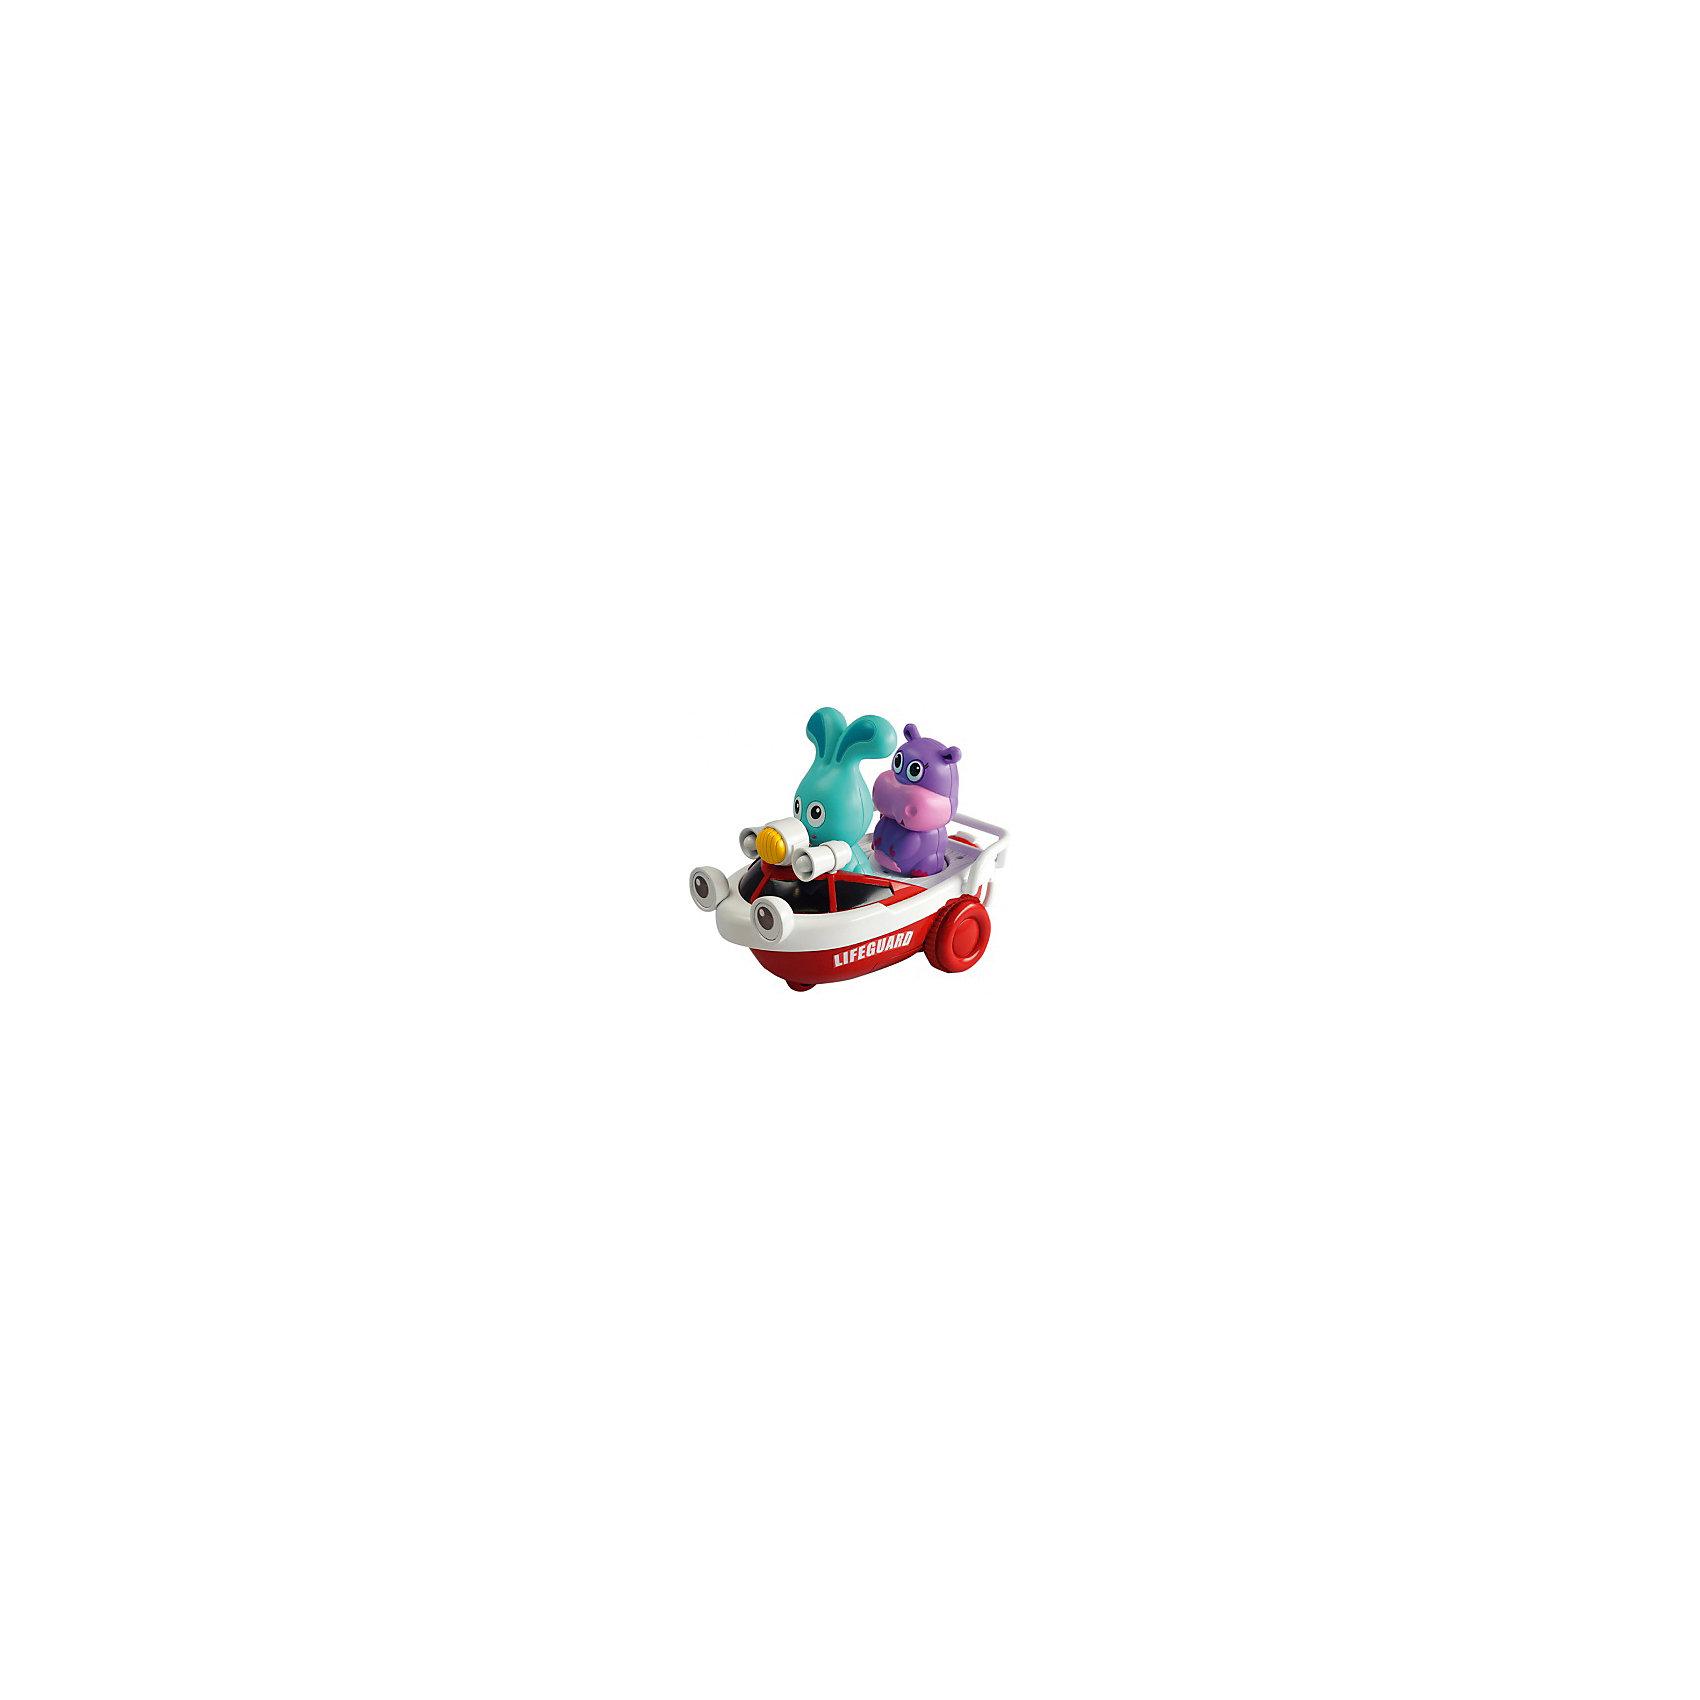 Ouaps Развивающая игрушка спасатель Бани на катере, Ouaps